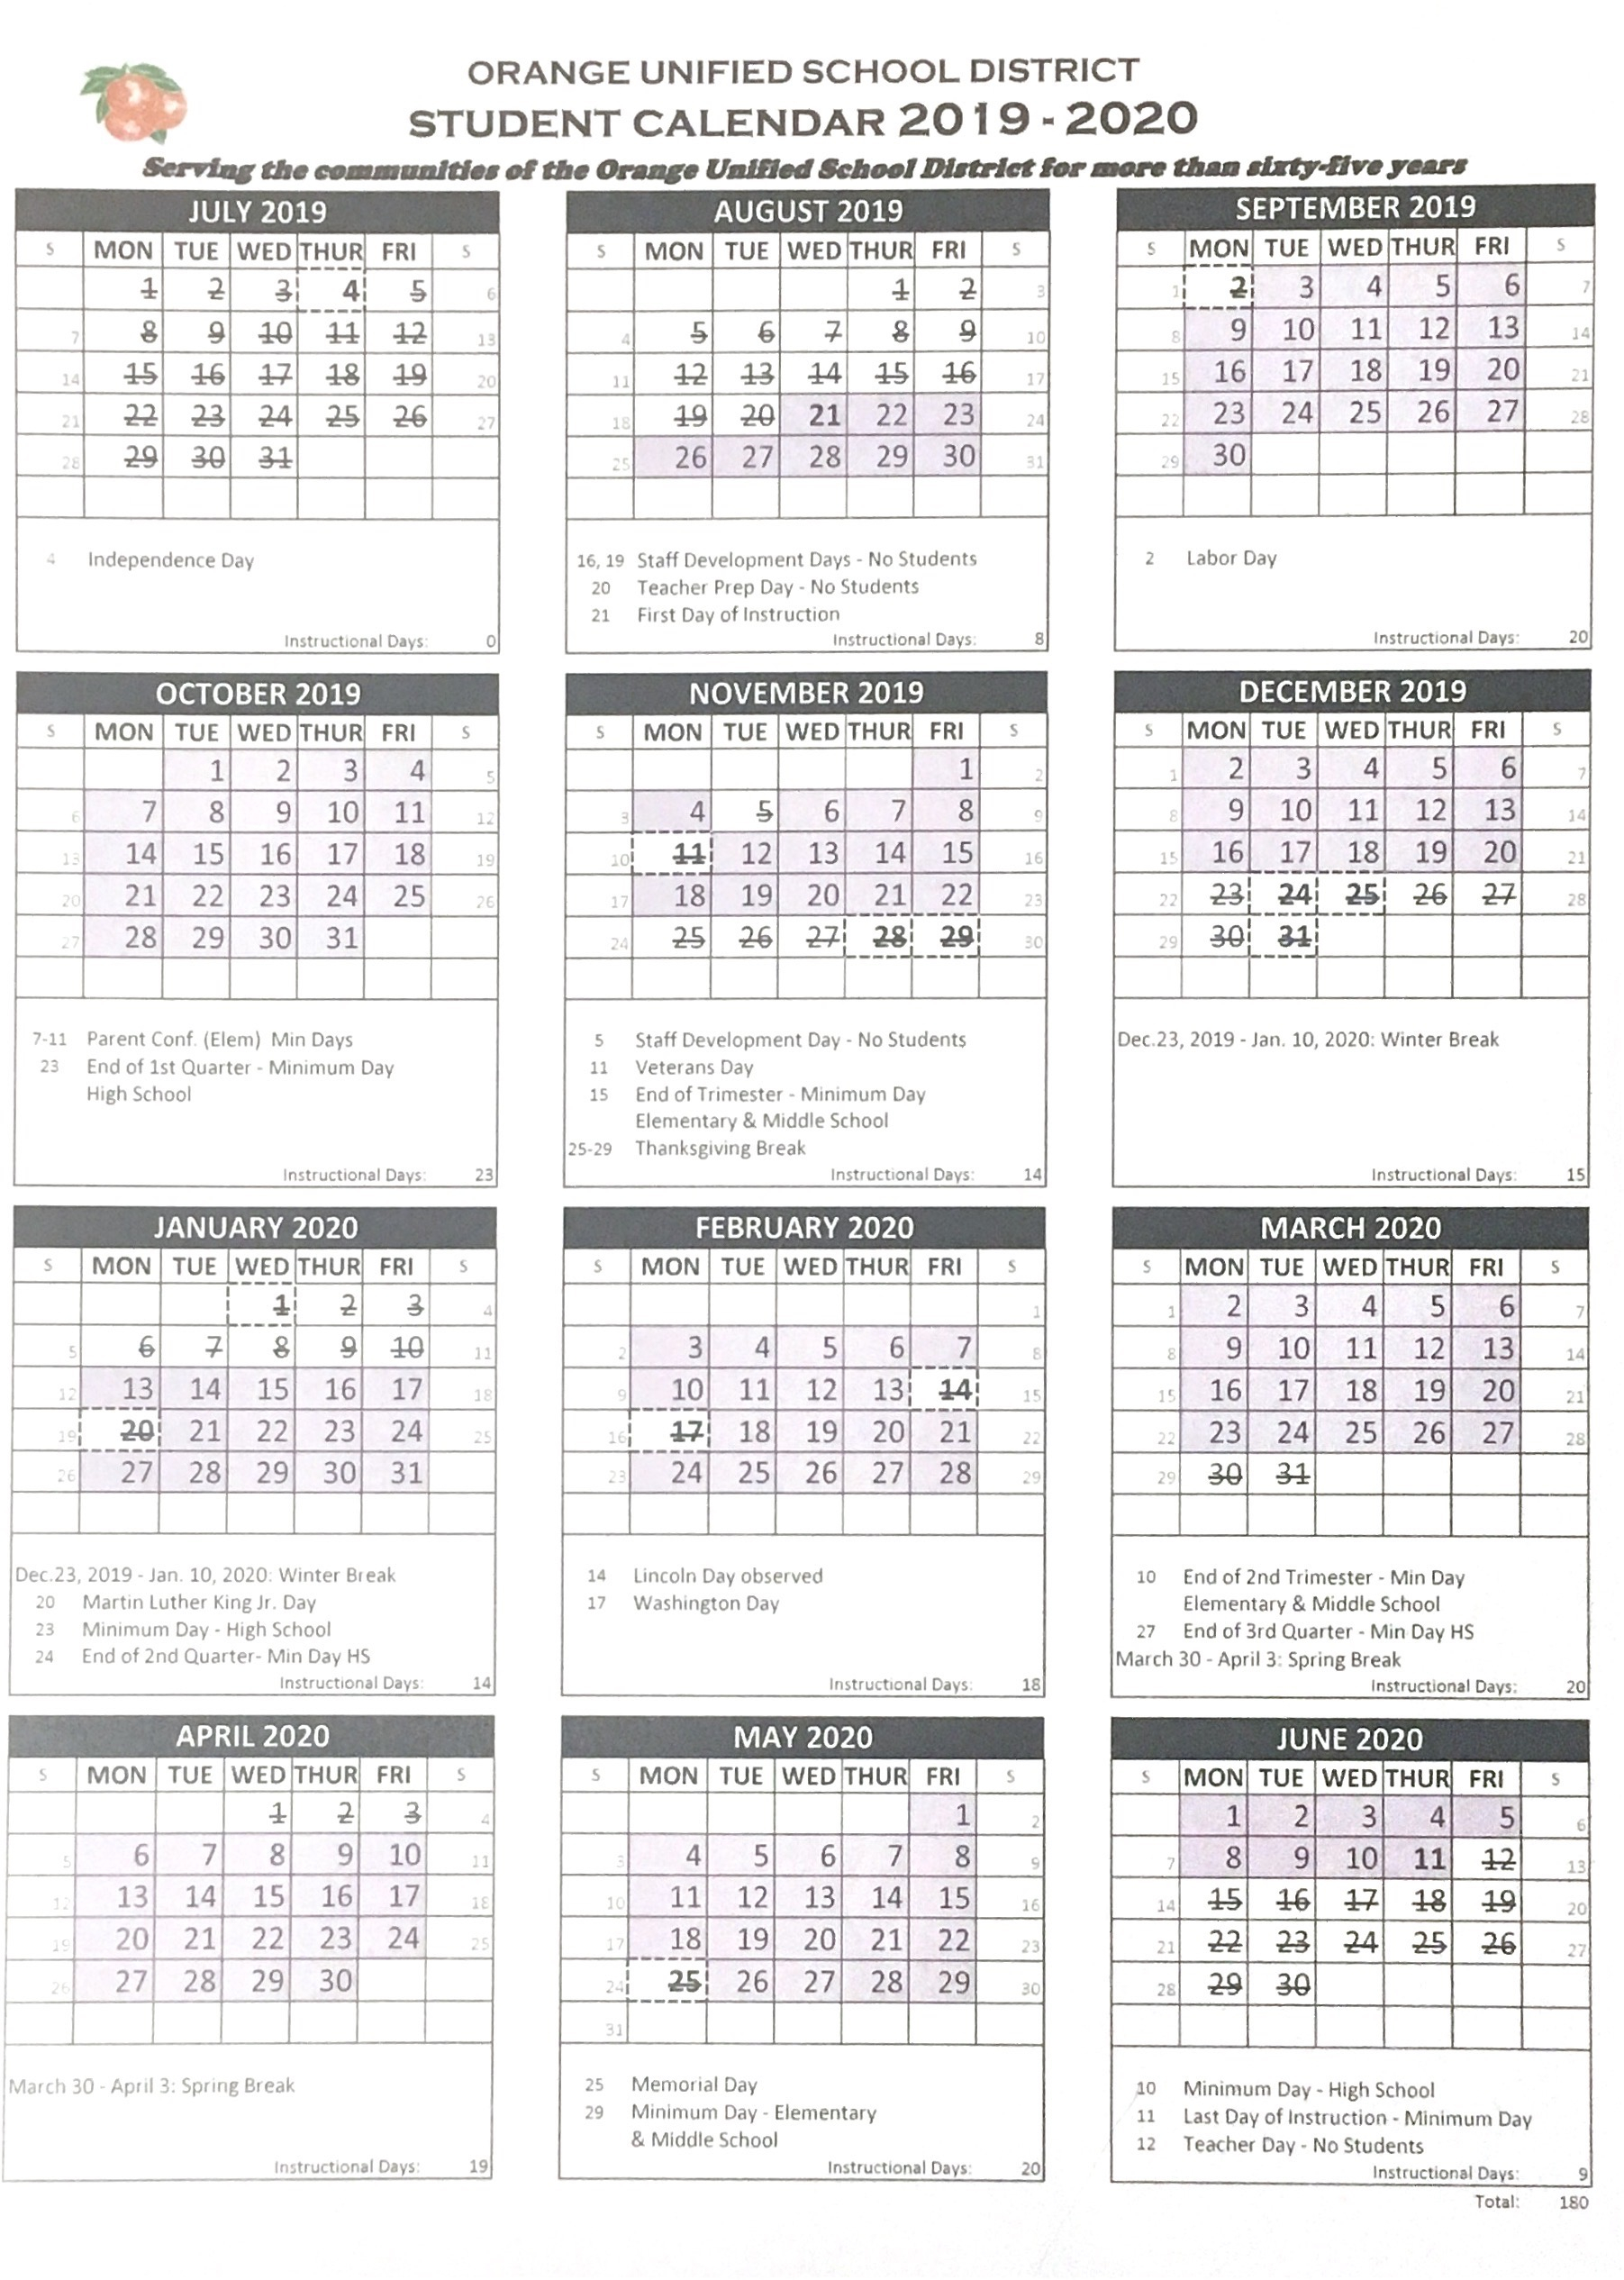 Student Calendar - Orange Unified School District Pertaining To Oceanside Unified School District Calendar